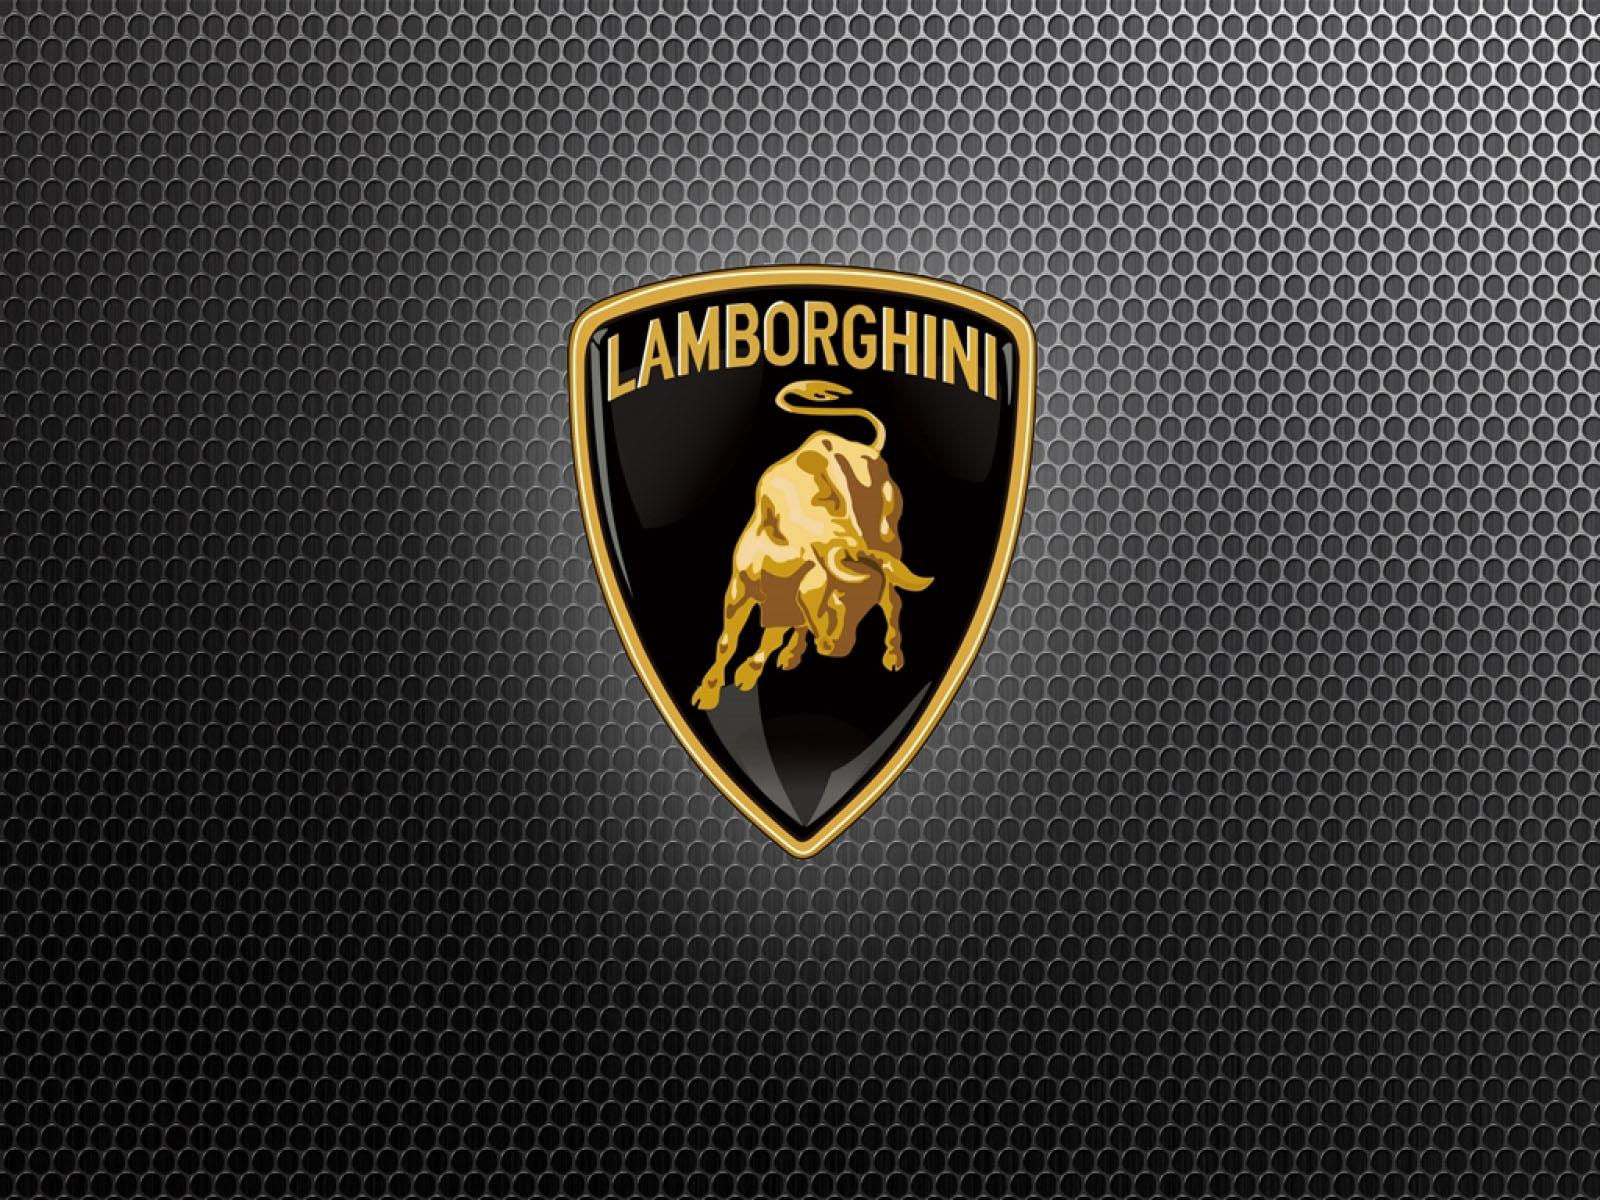 Lamborghini Logo Wallpaper 1600x1200